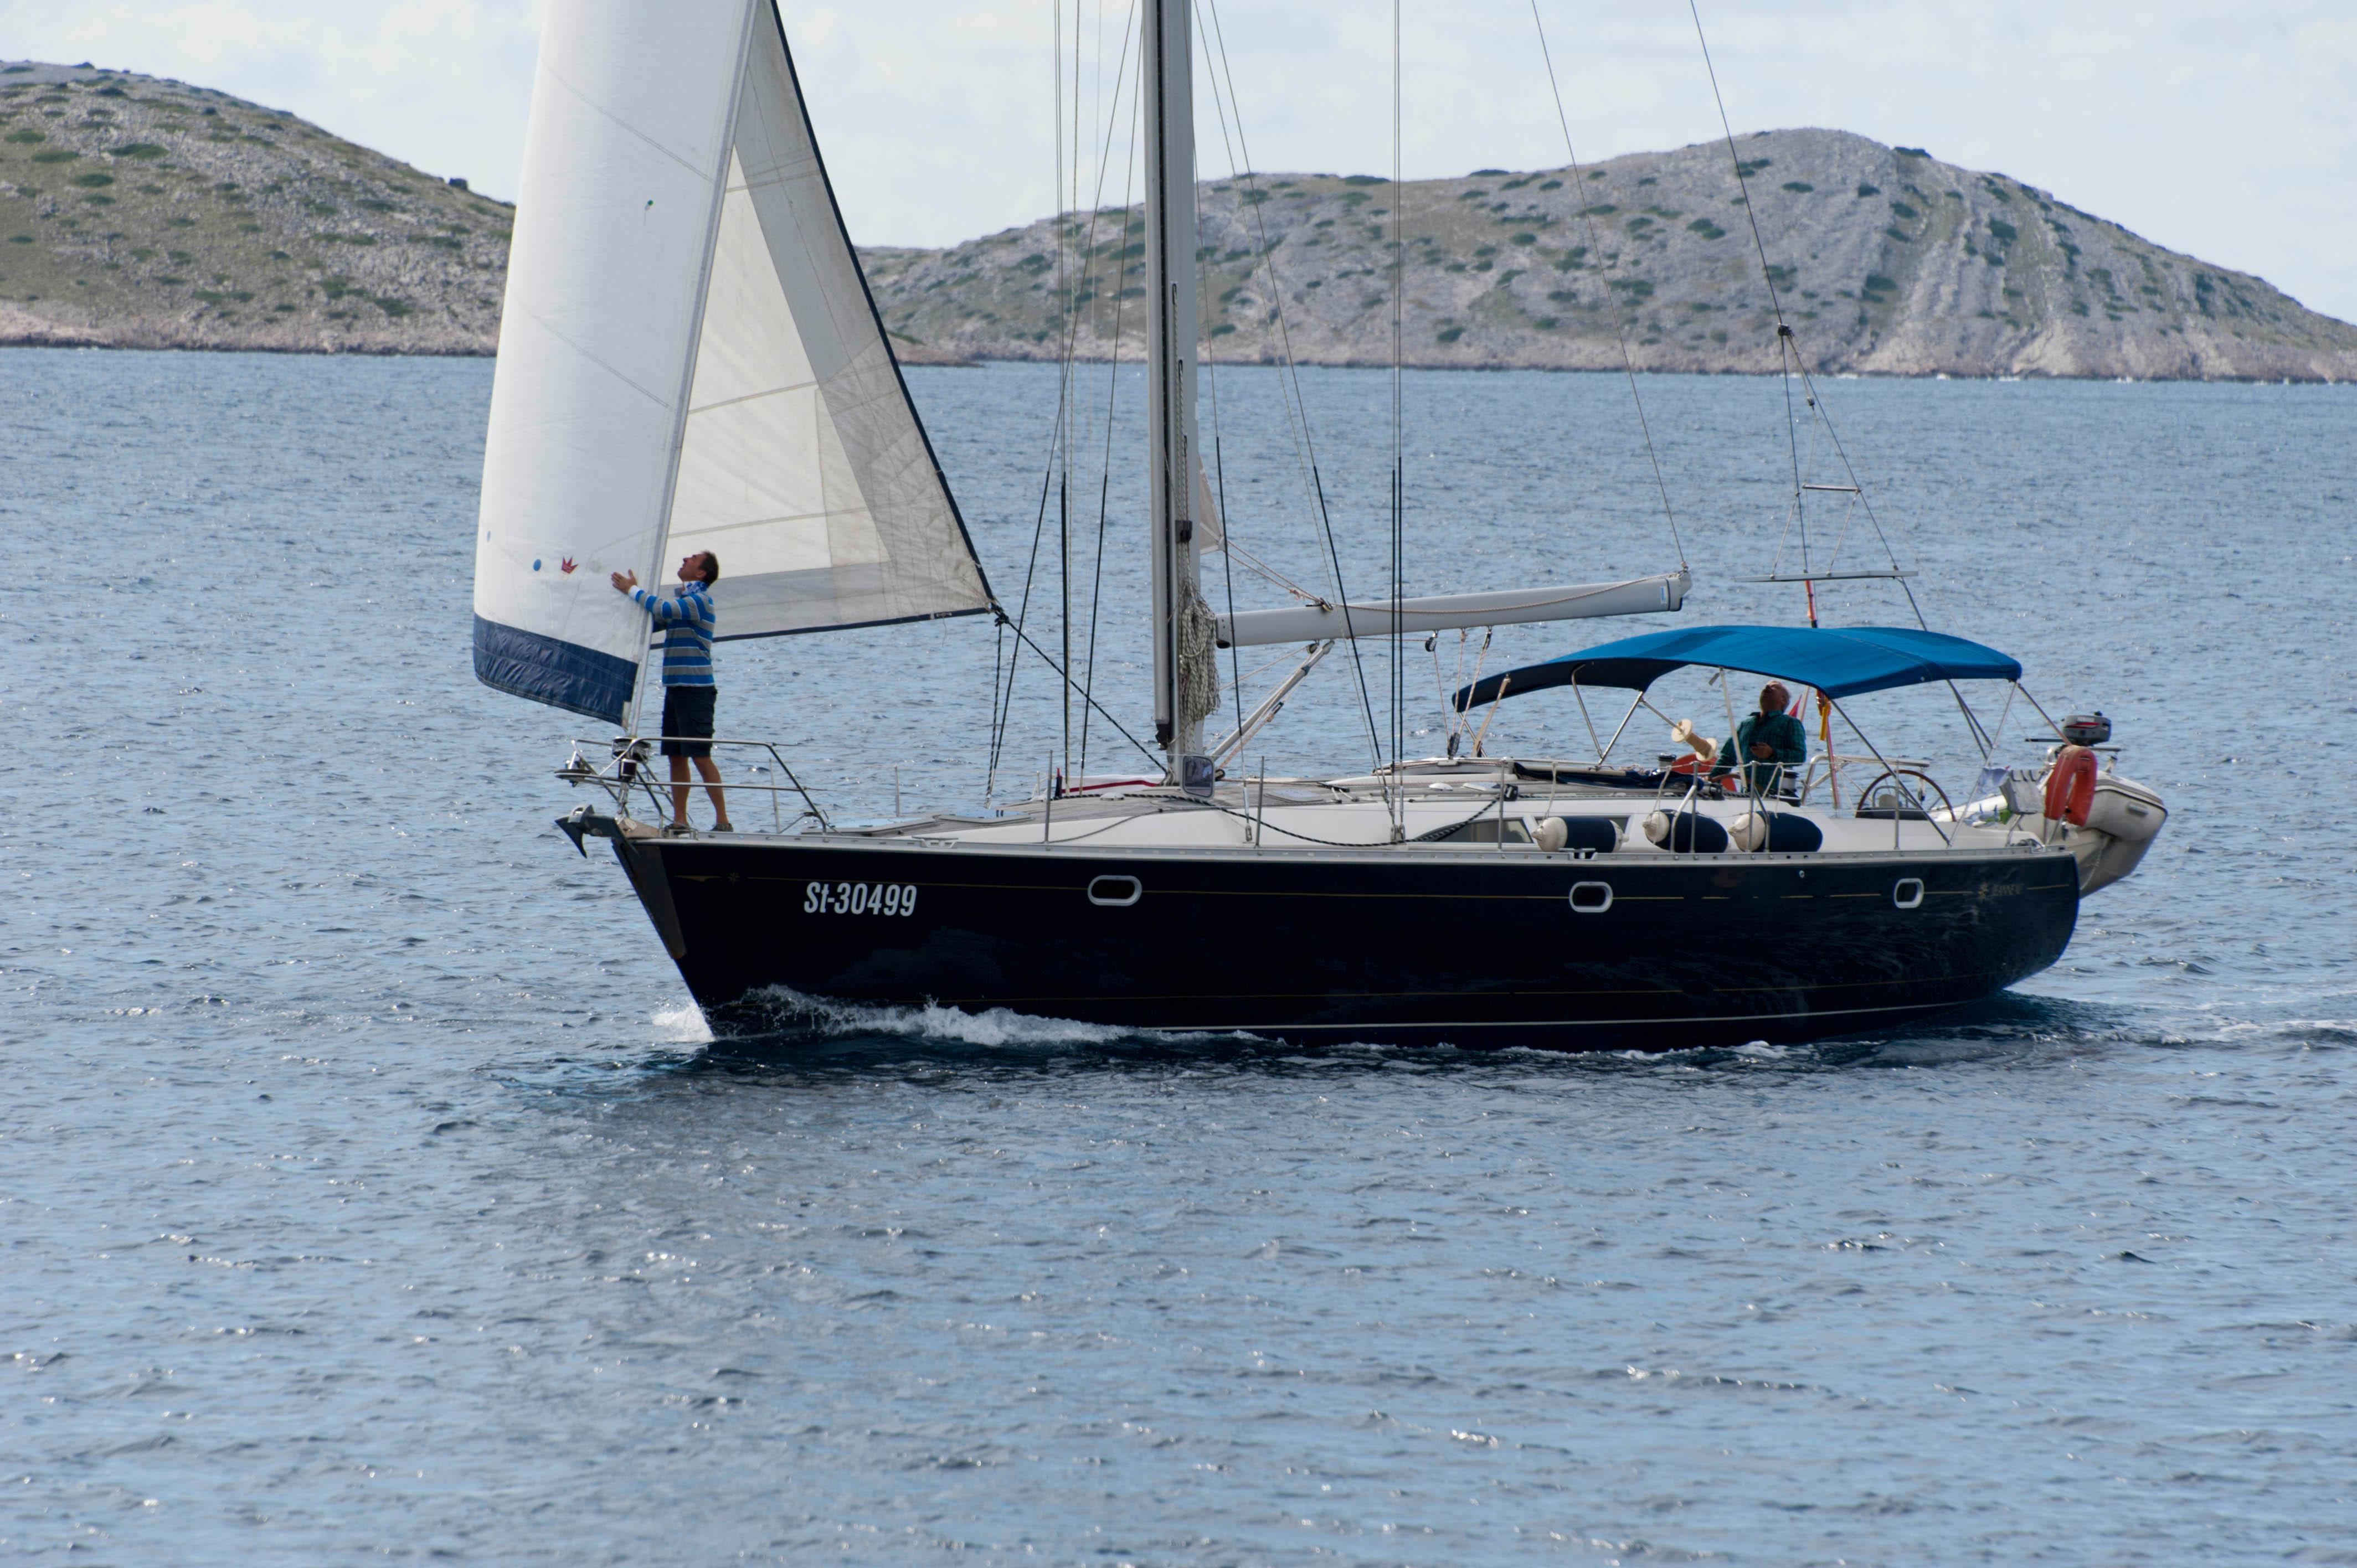 9619-Parc national iles Kornati (Dalmatie du Nord)